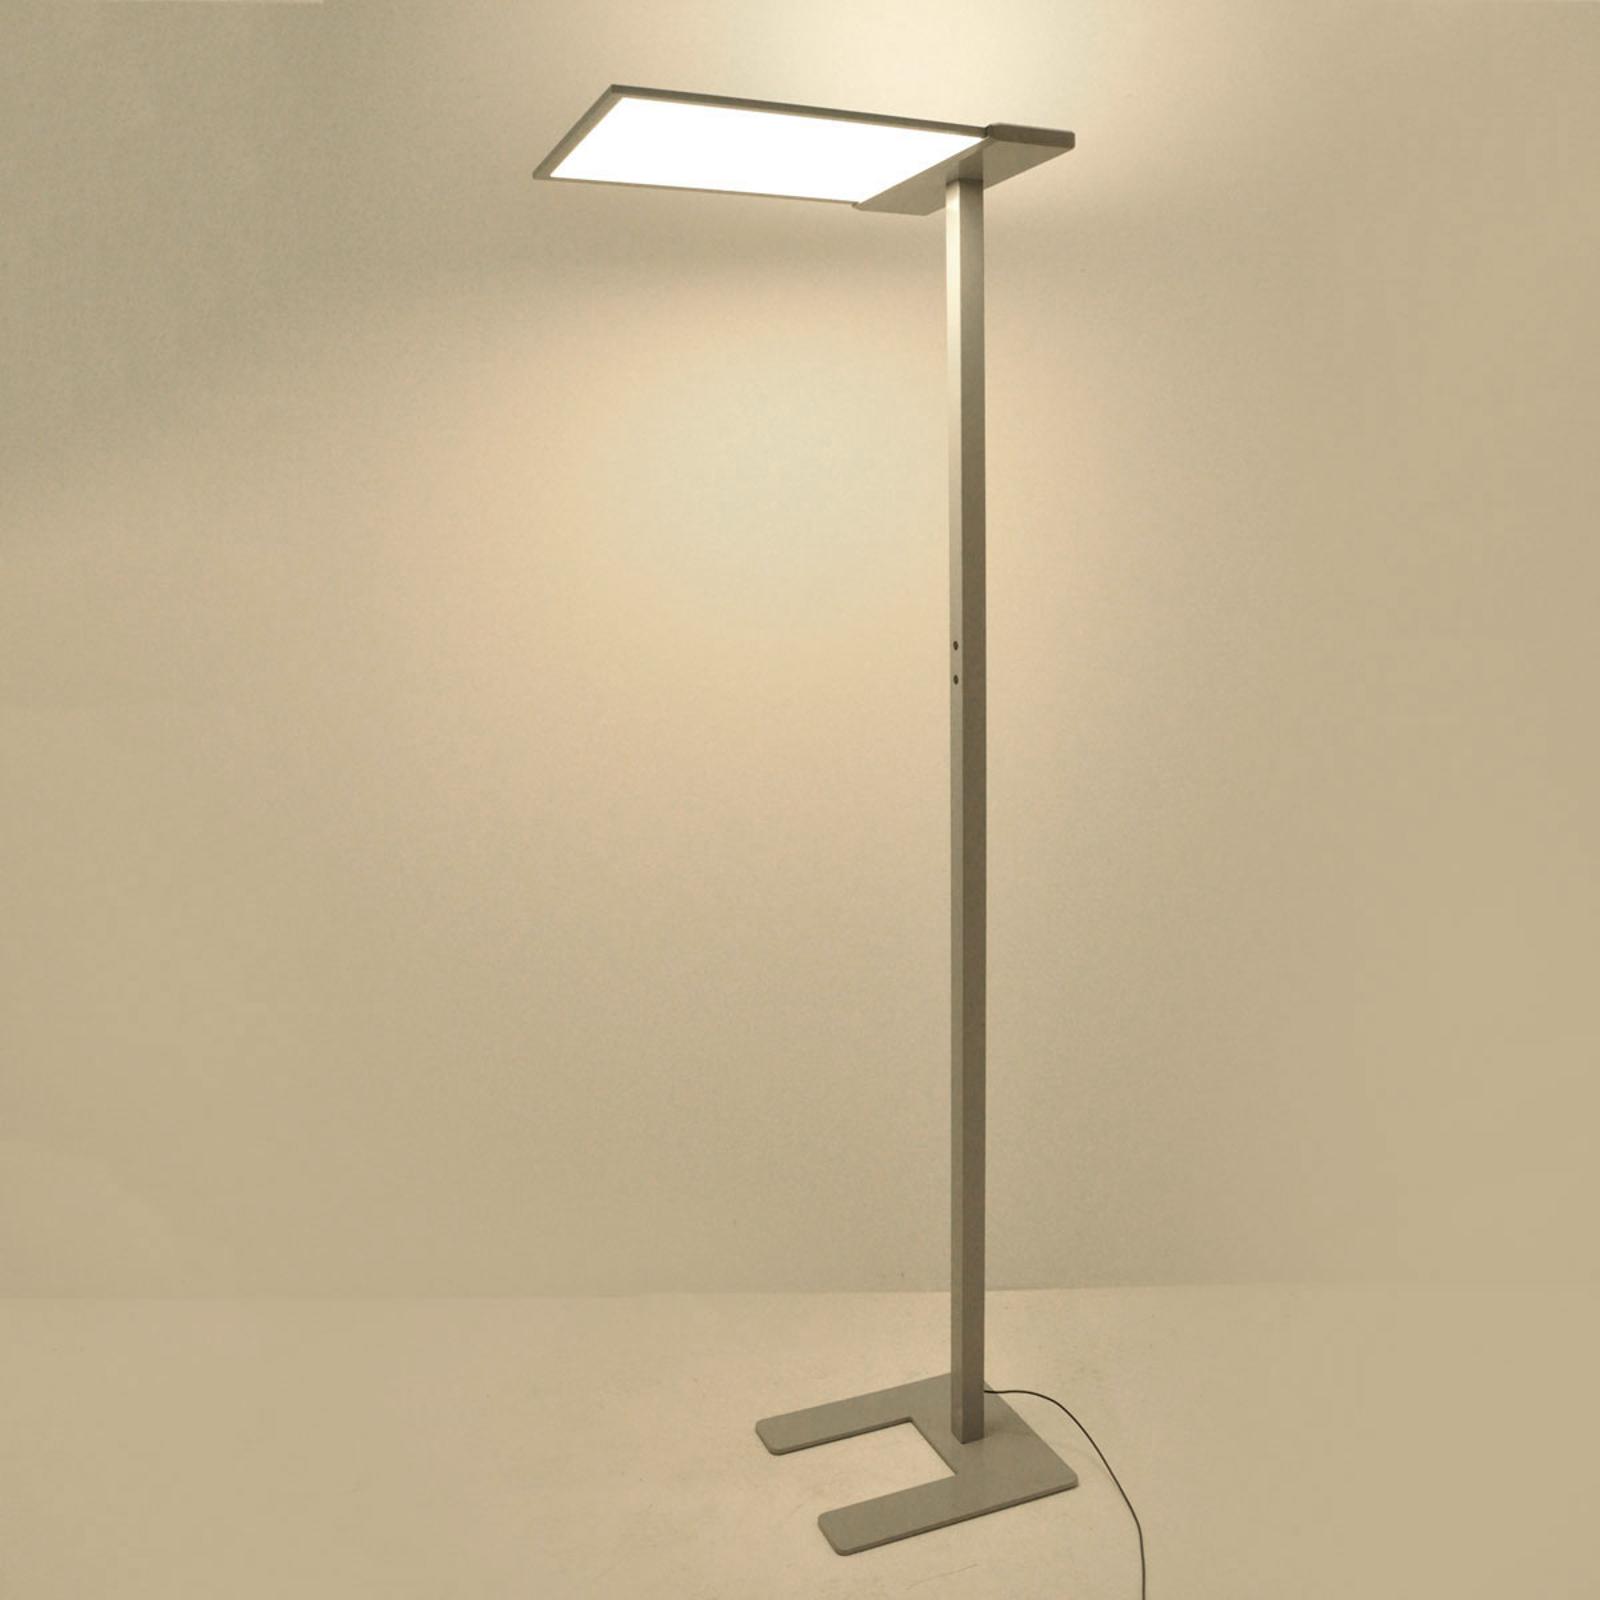 Acquista Lampada da pavimento LED Esmael, 36W + 20W